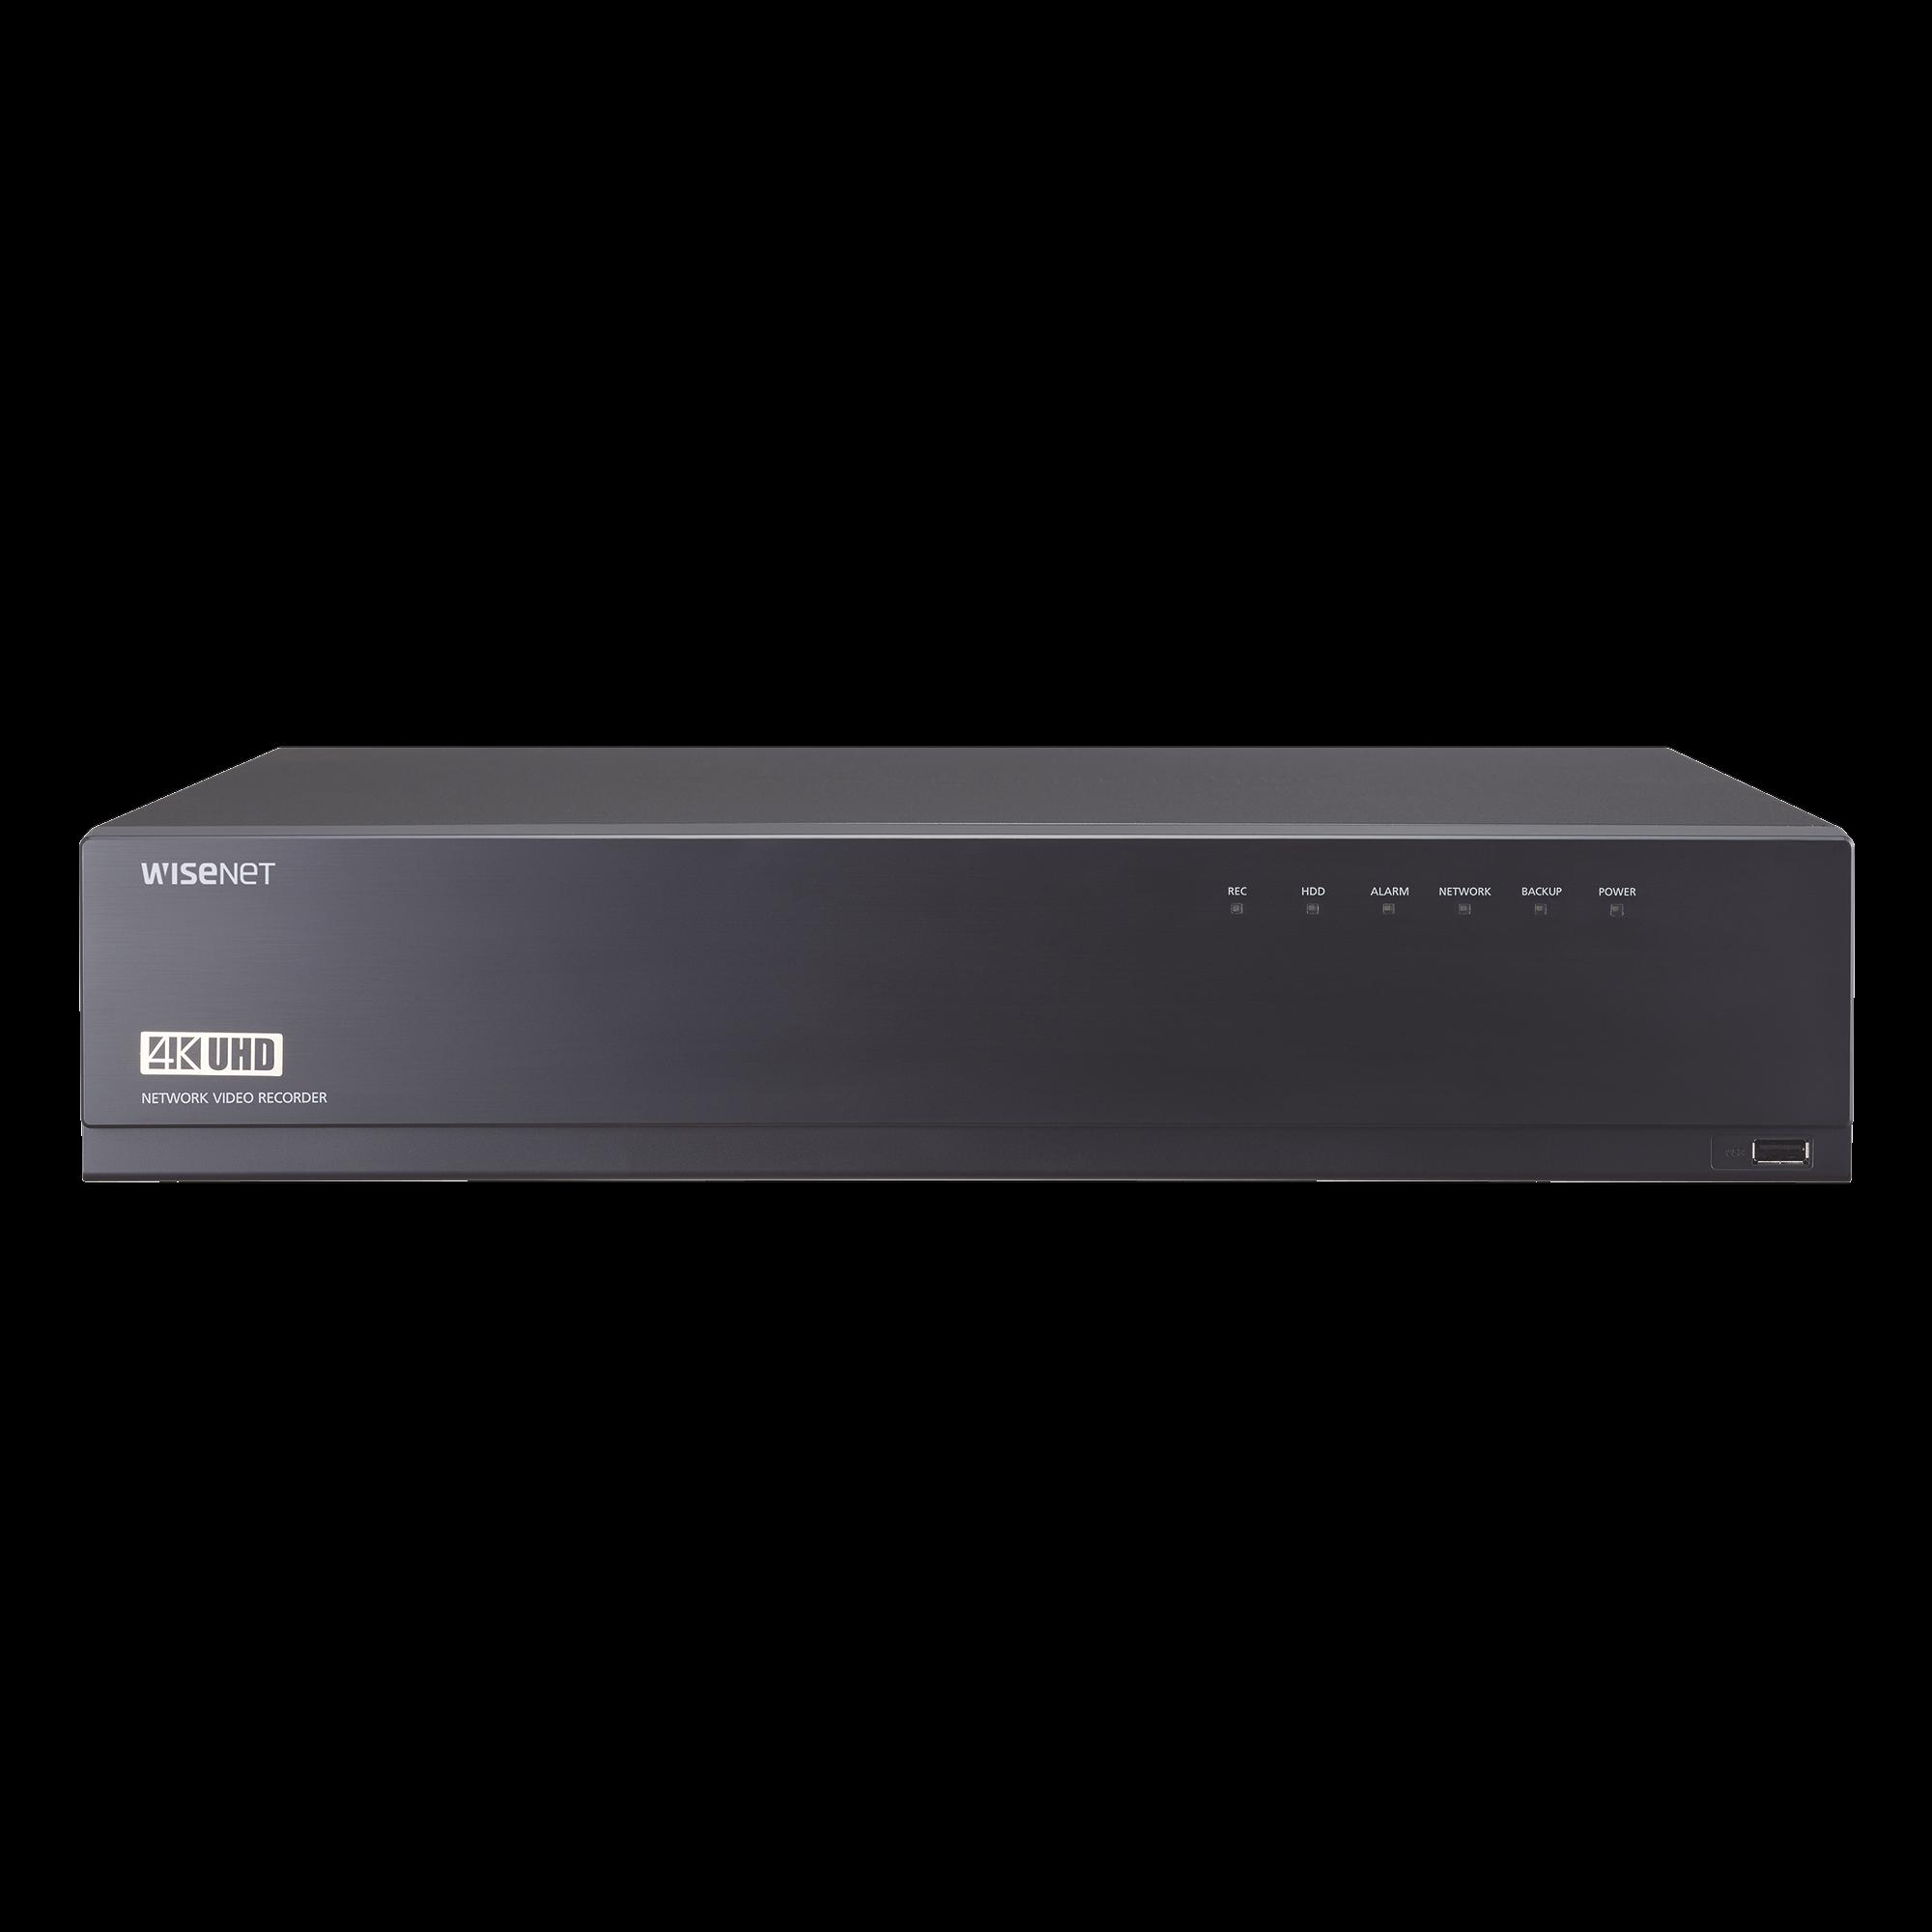 NVR de 16 canales / 12MP / Hasta 4 Discos Duros / Switch PoE+ 16 puertos / Wisenet P2P / H.265 & WiseStream